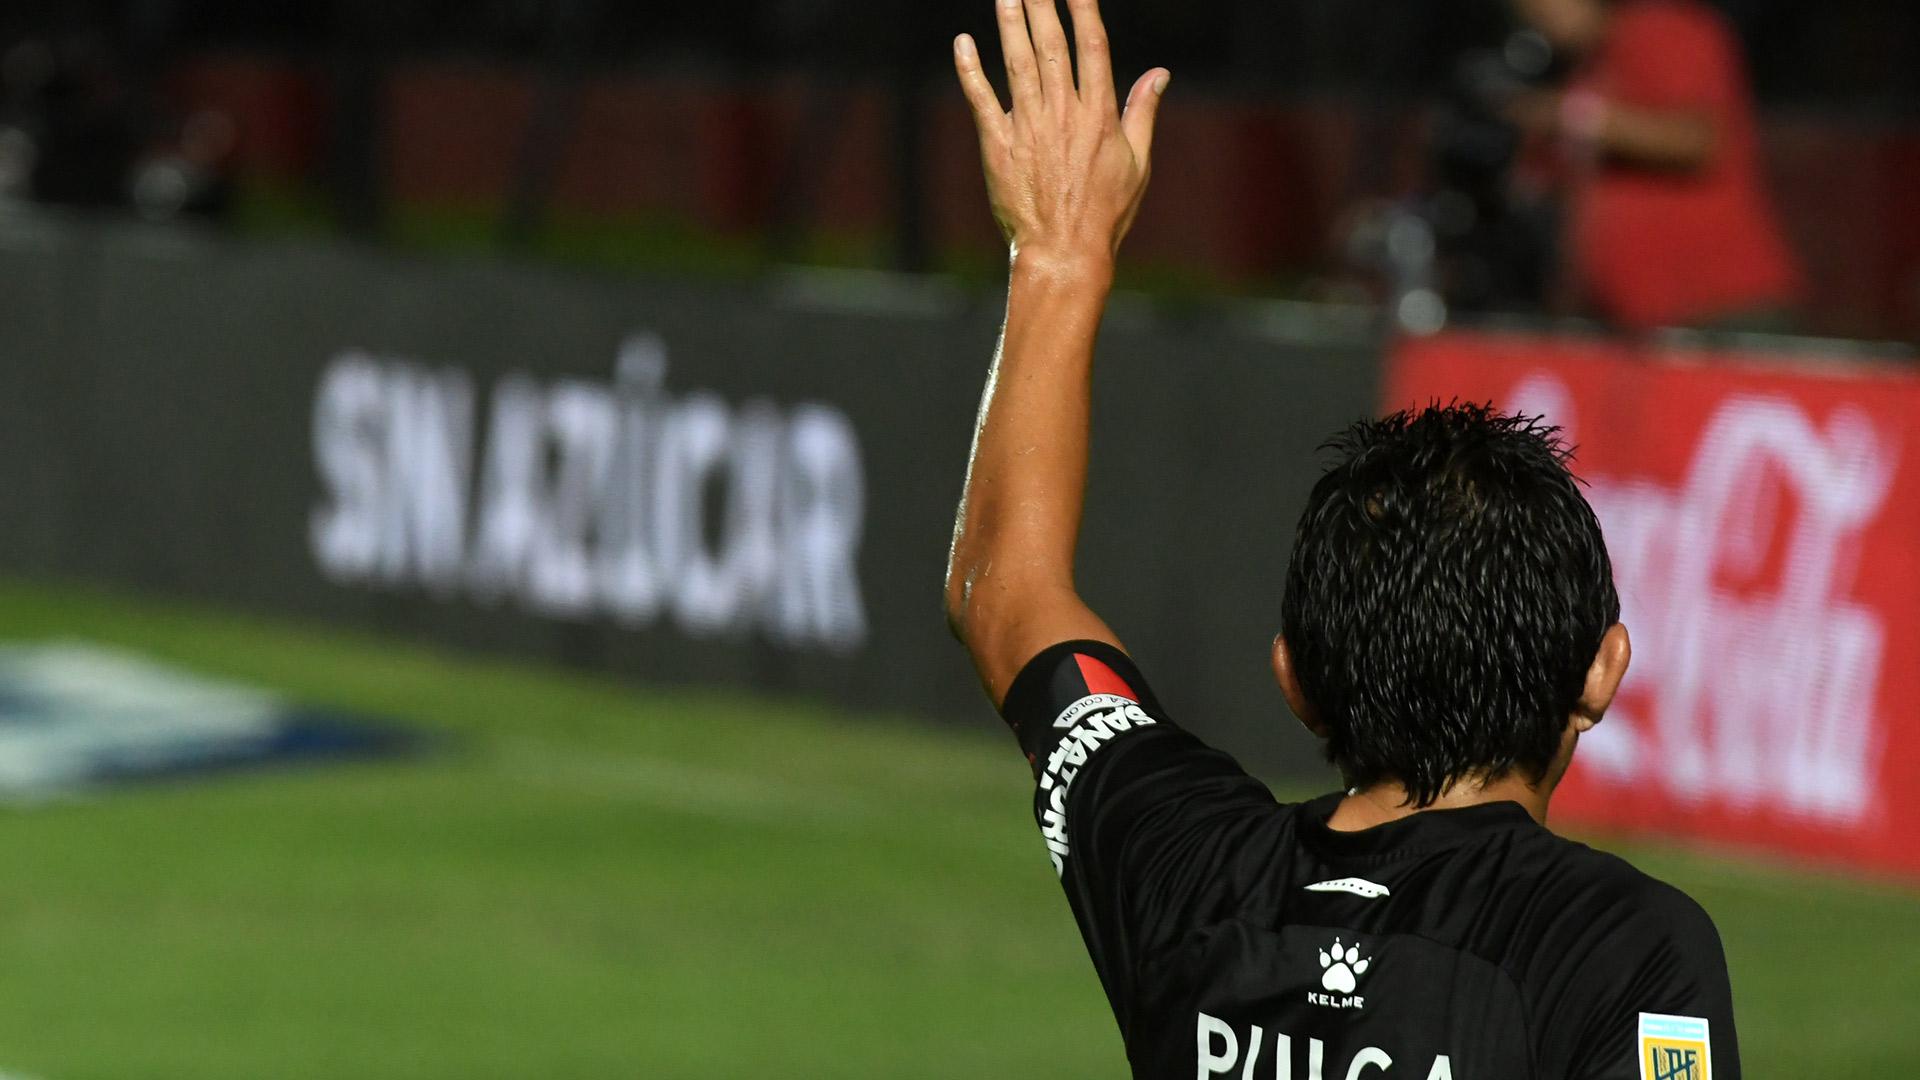 Pulga-Rodríguez_01Port2